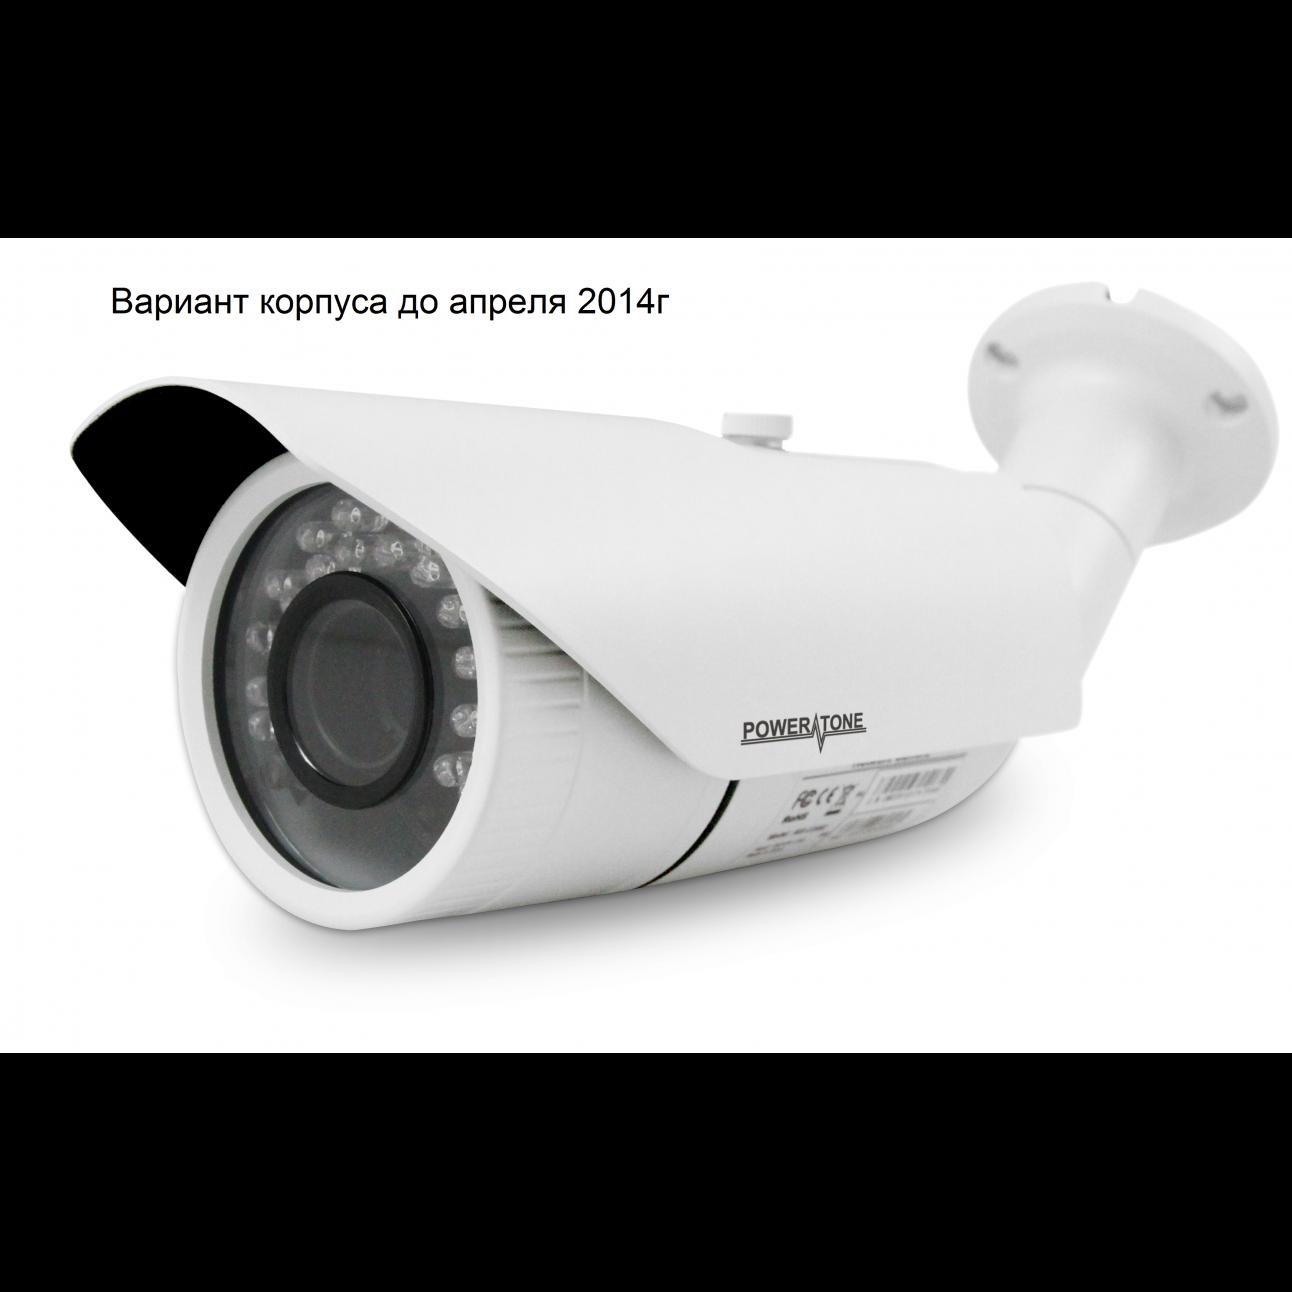 IP камера POWERTONE уличная 1.3Мп, c ИК подсветкой, 2.8-12мм, PoE, с обогревателем, с кронштейном